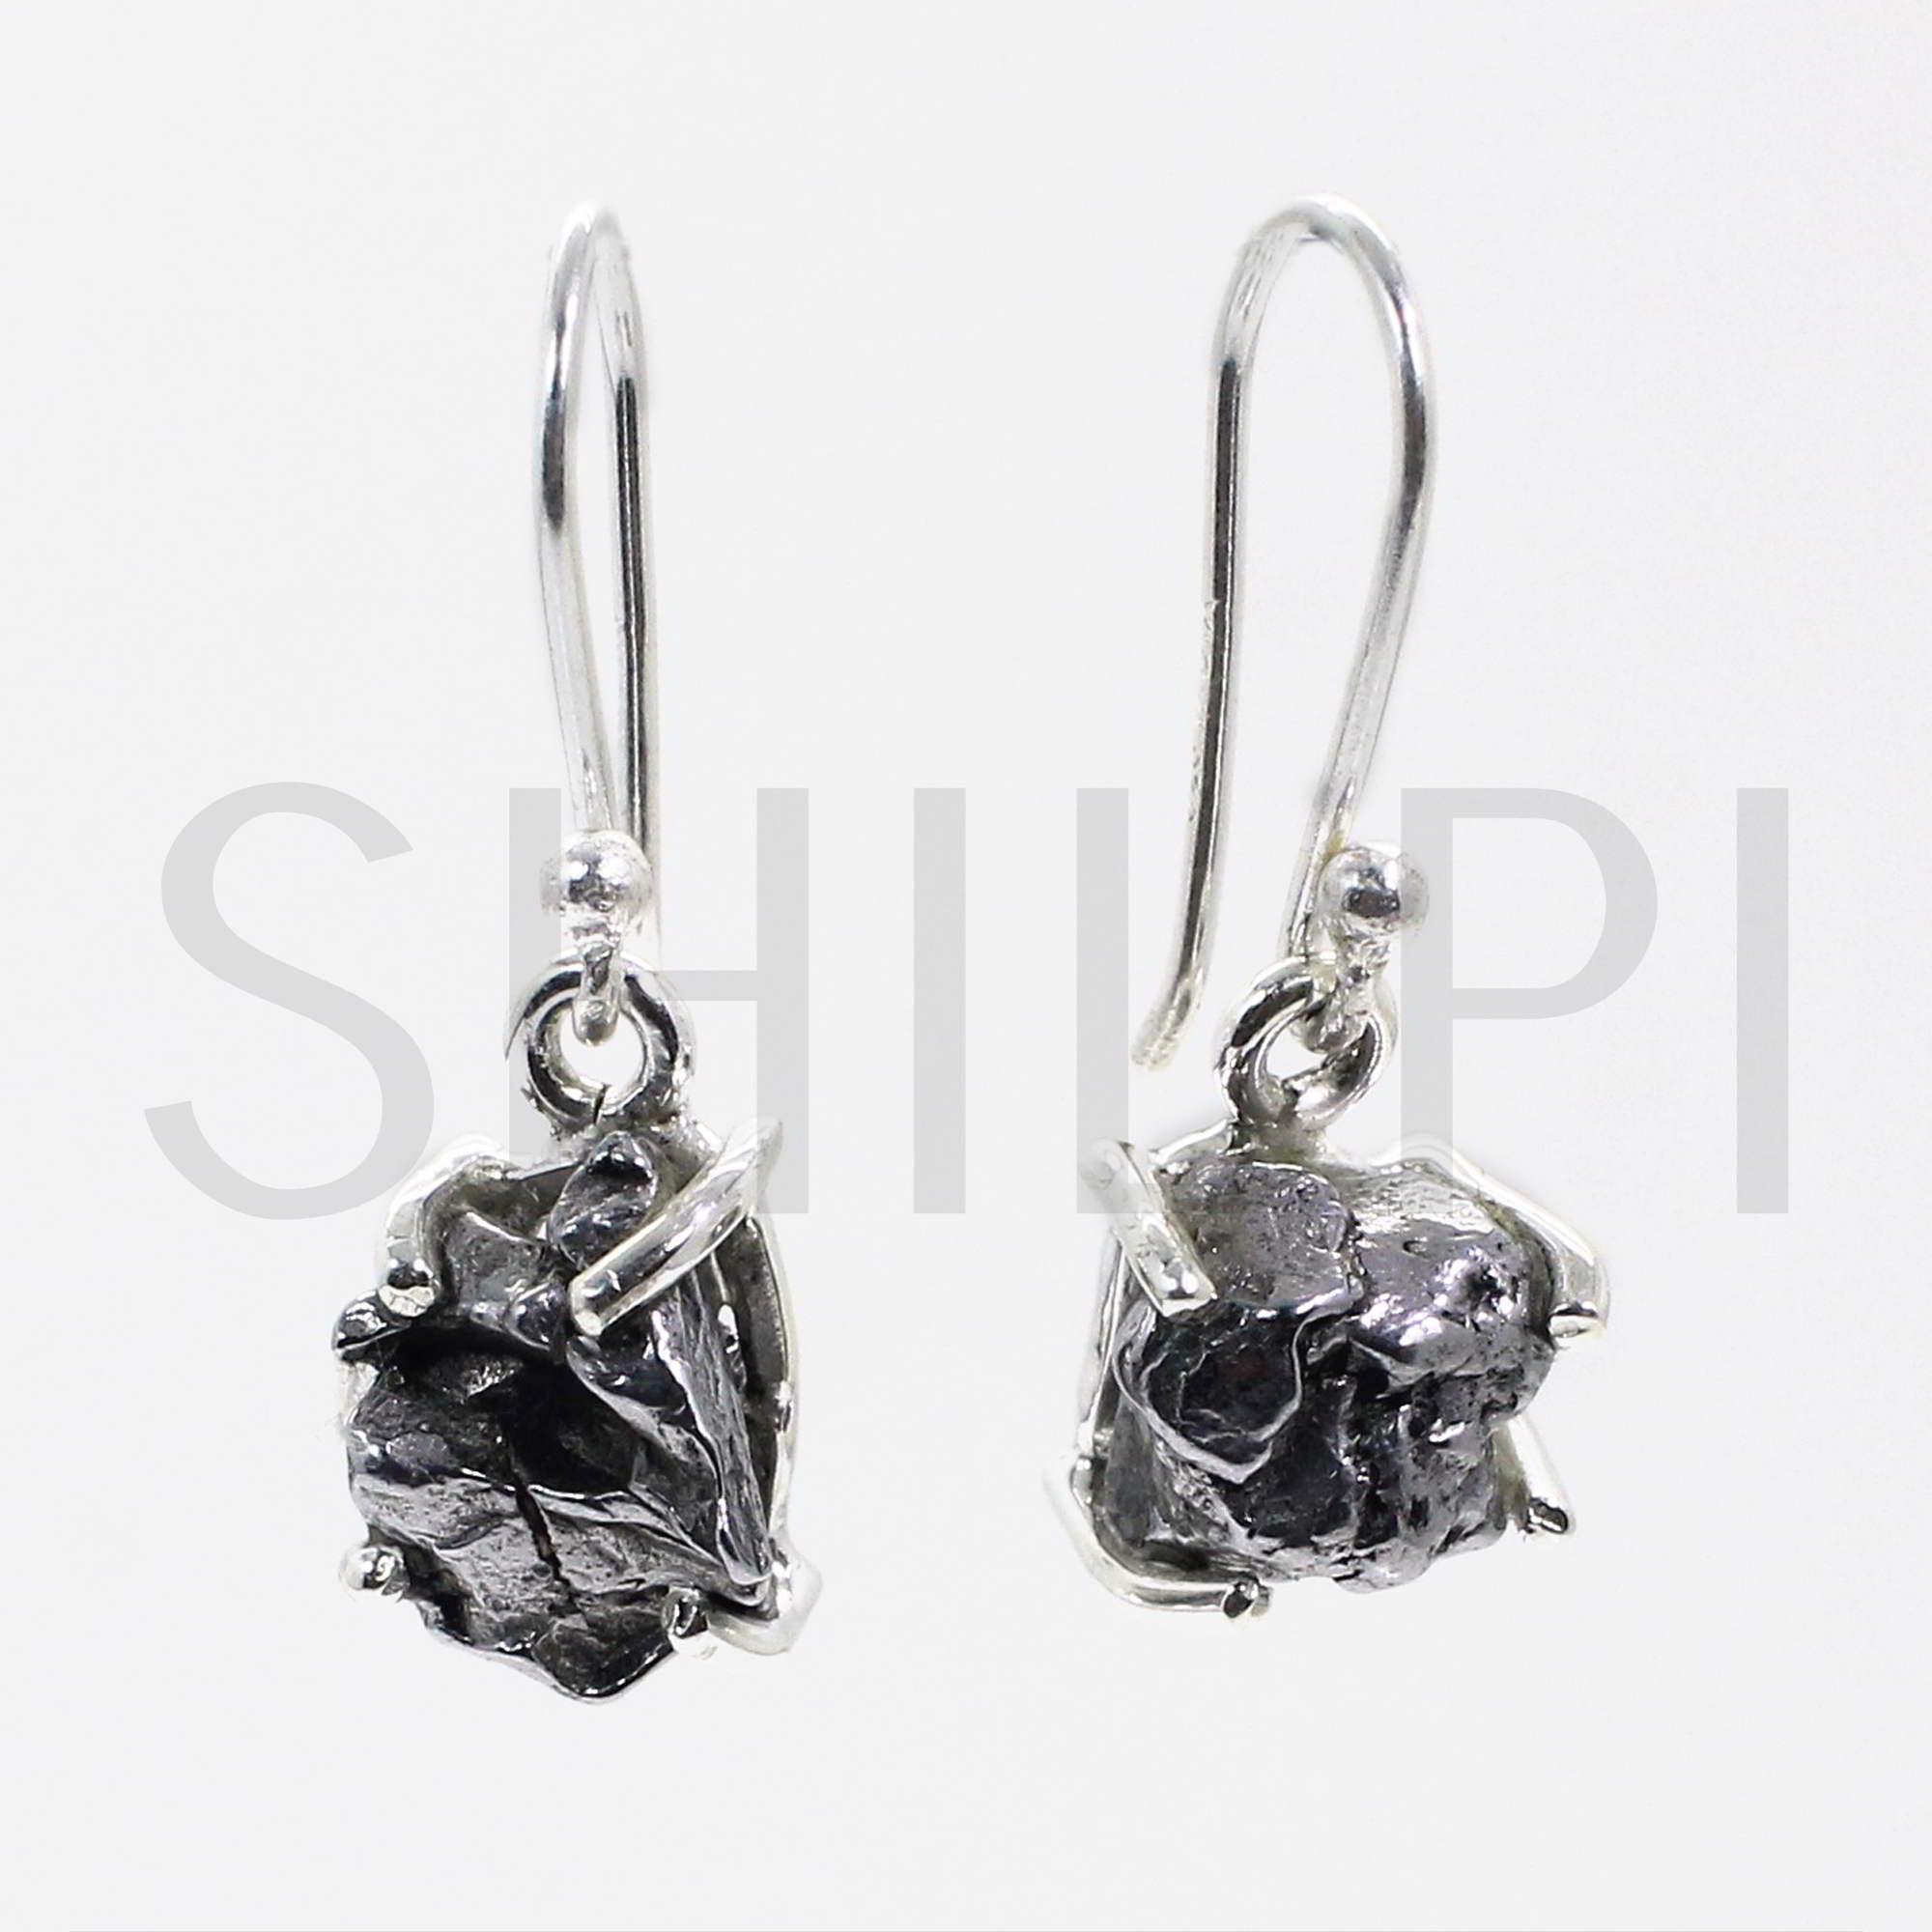 Natural Meteorite 925 Sterling Silver Prong Set Dangle Earrings